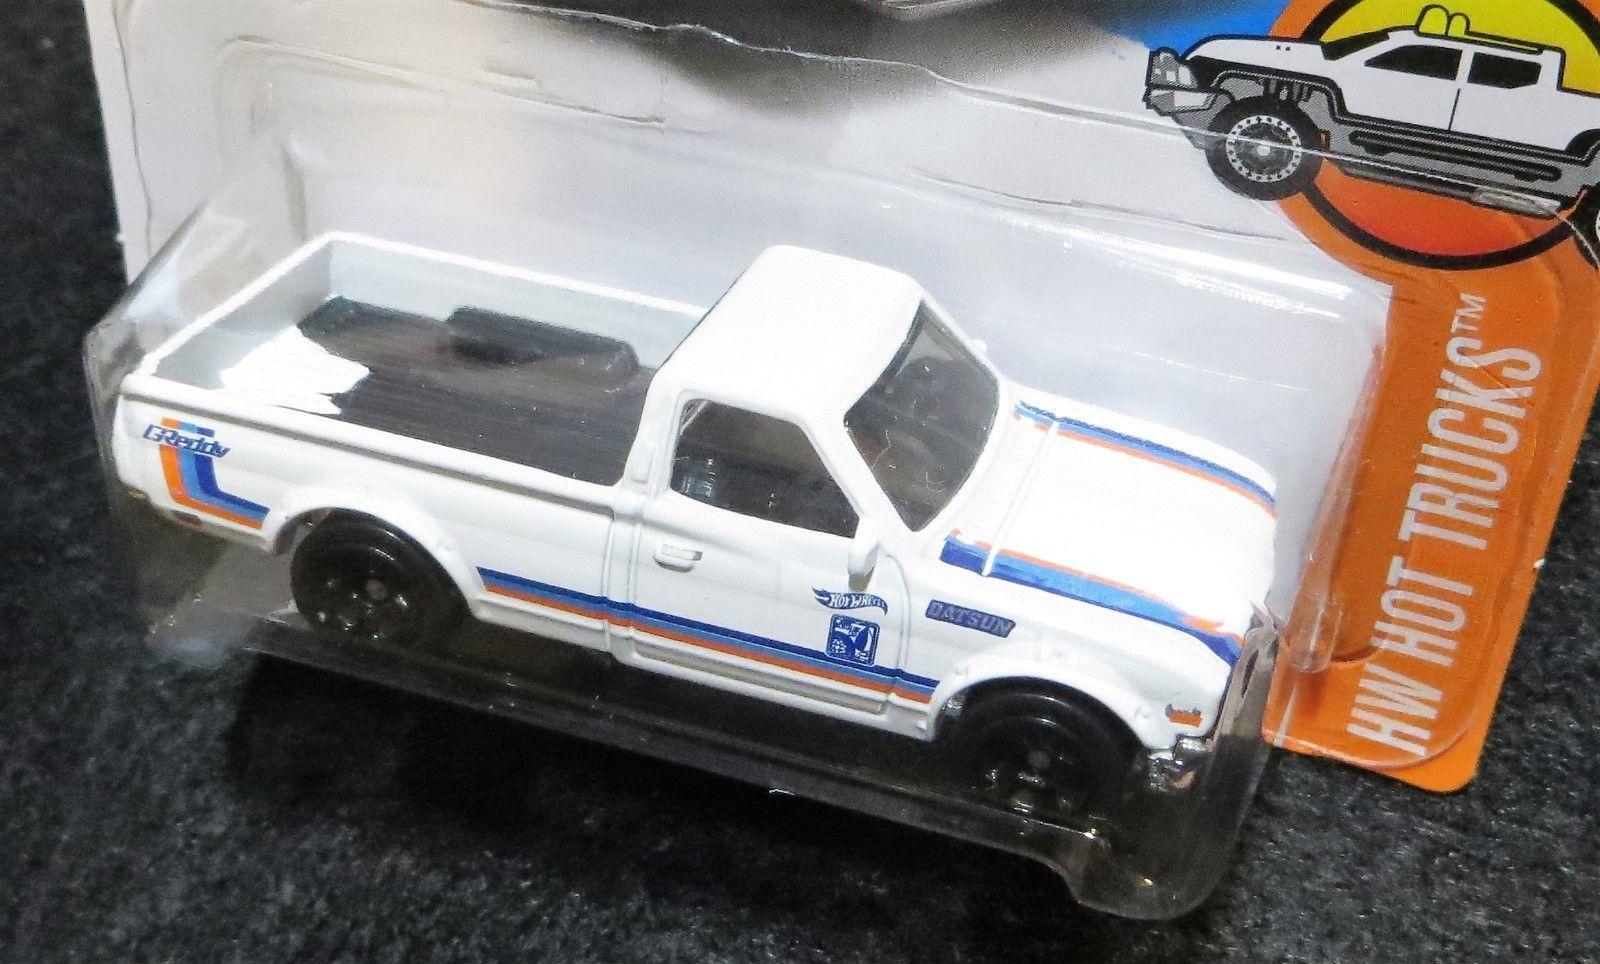 2017 Hot Wheels White Datsun 620 Pickup Hw And 50 Similar Items